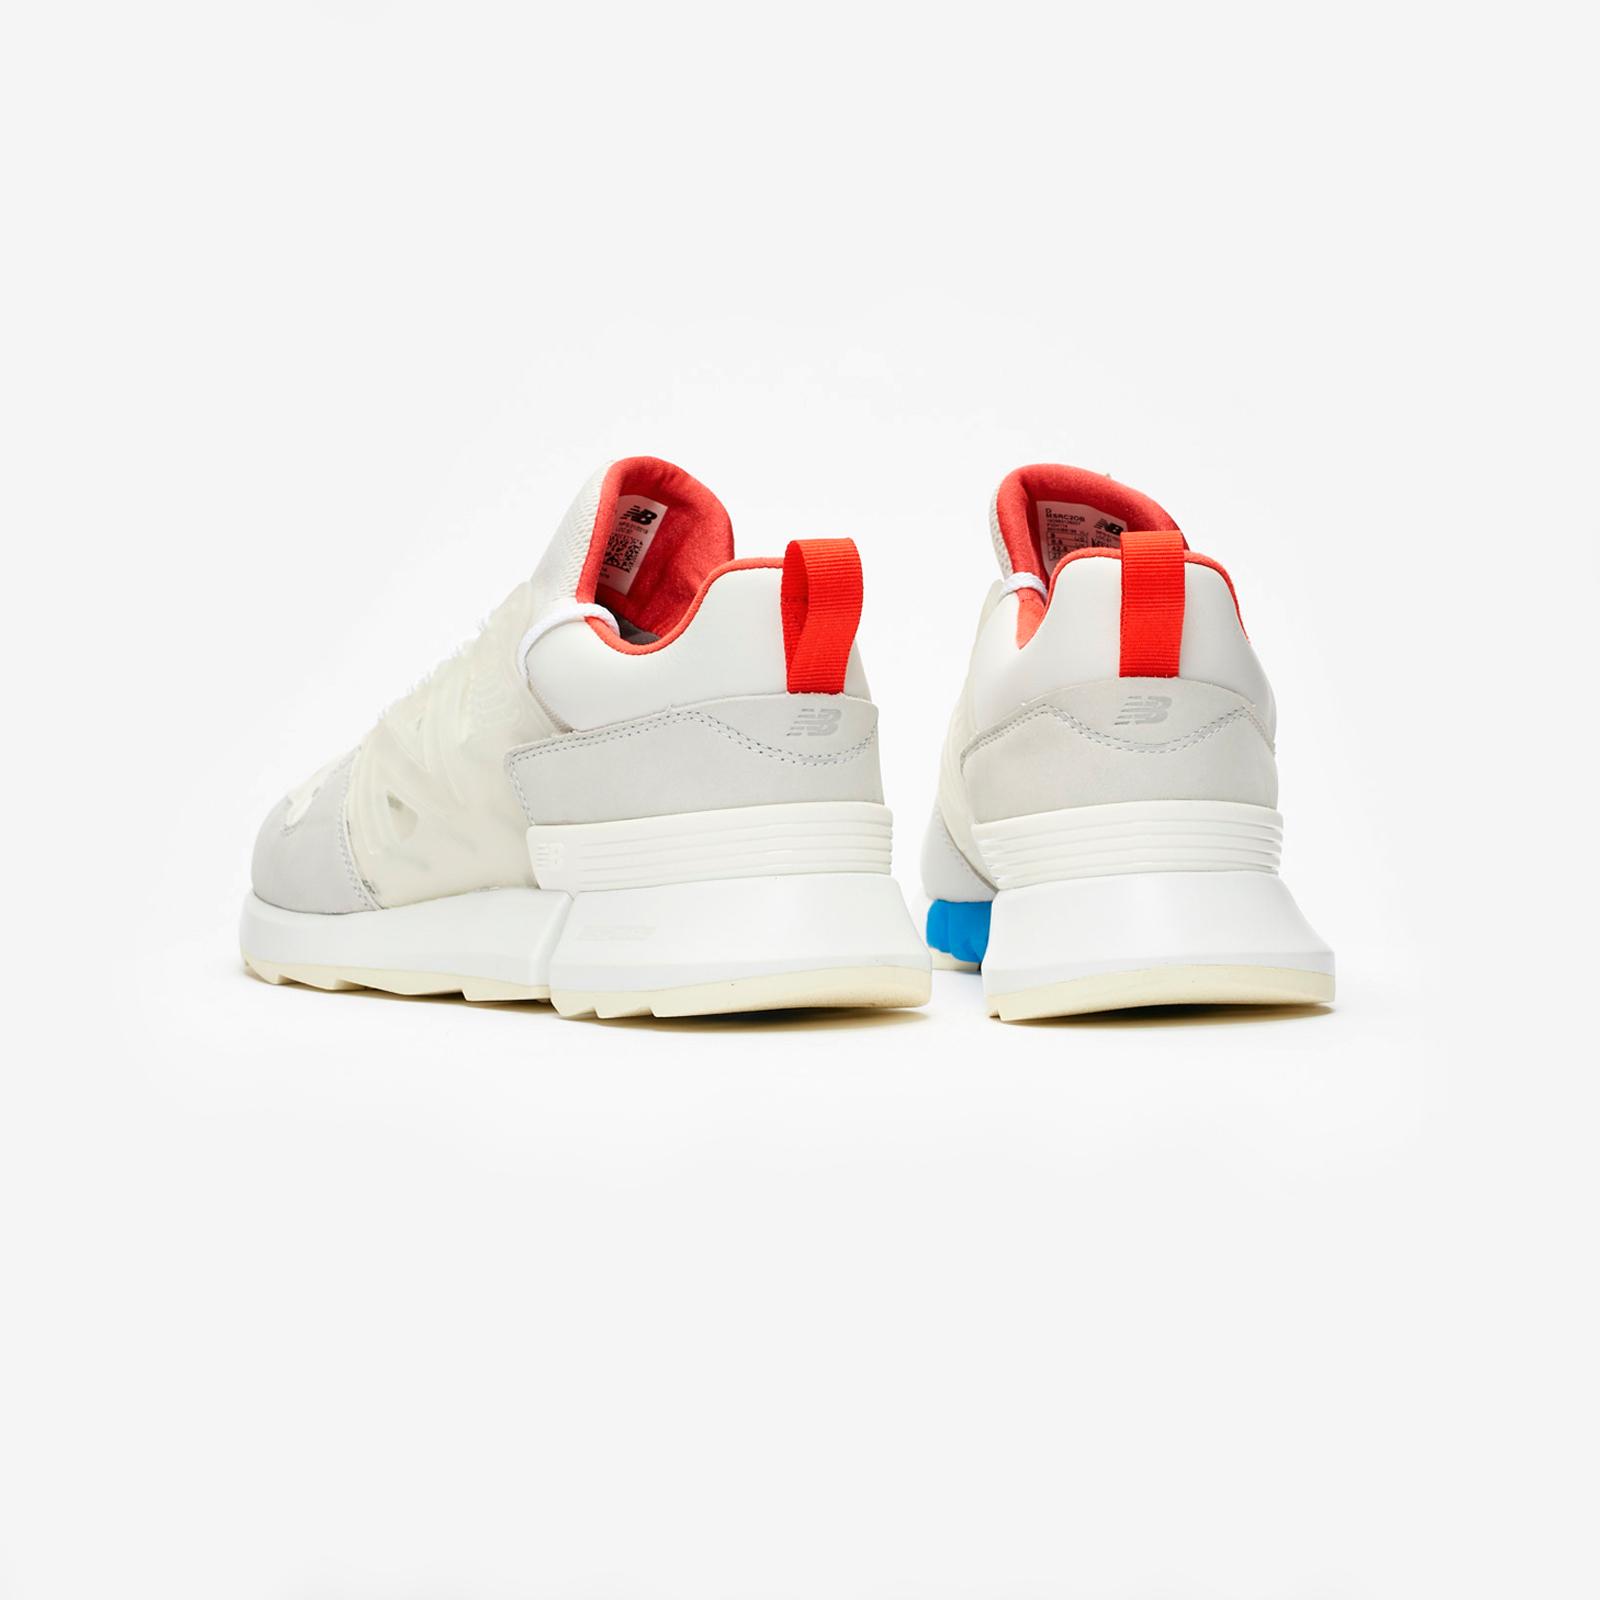 New Balance MSRC2 - Msrc2ob - Sneakersnstuff | sneakers & streetwear